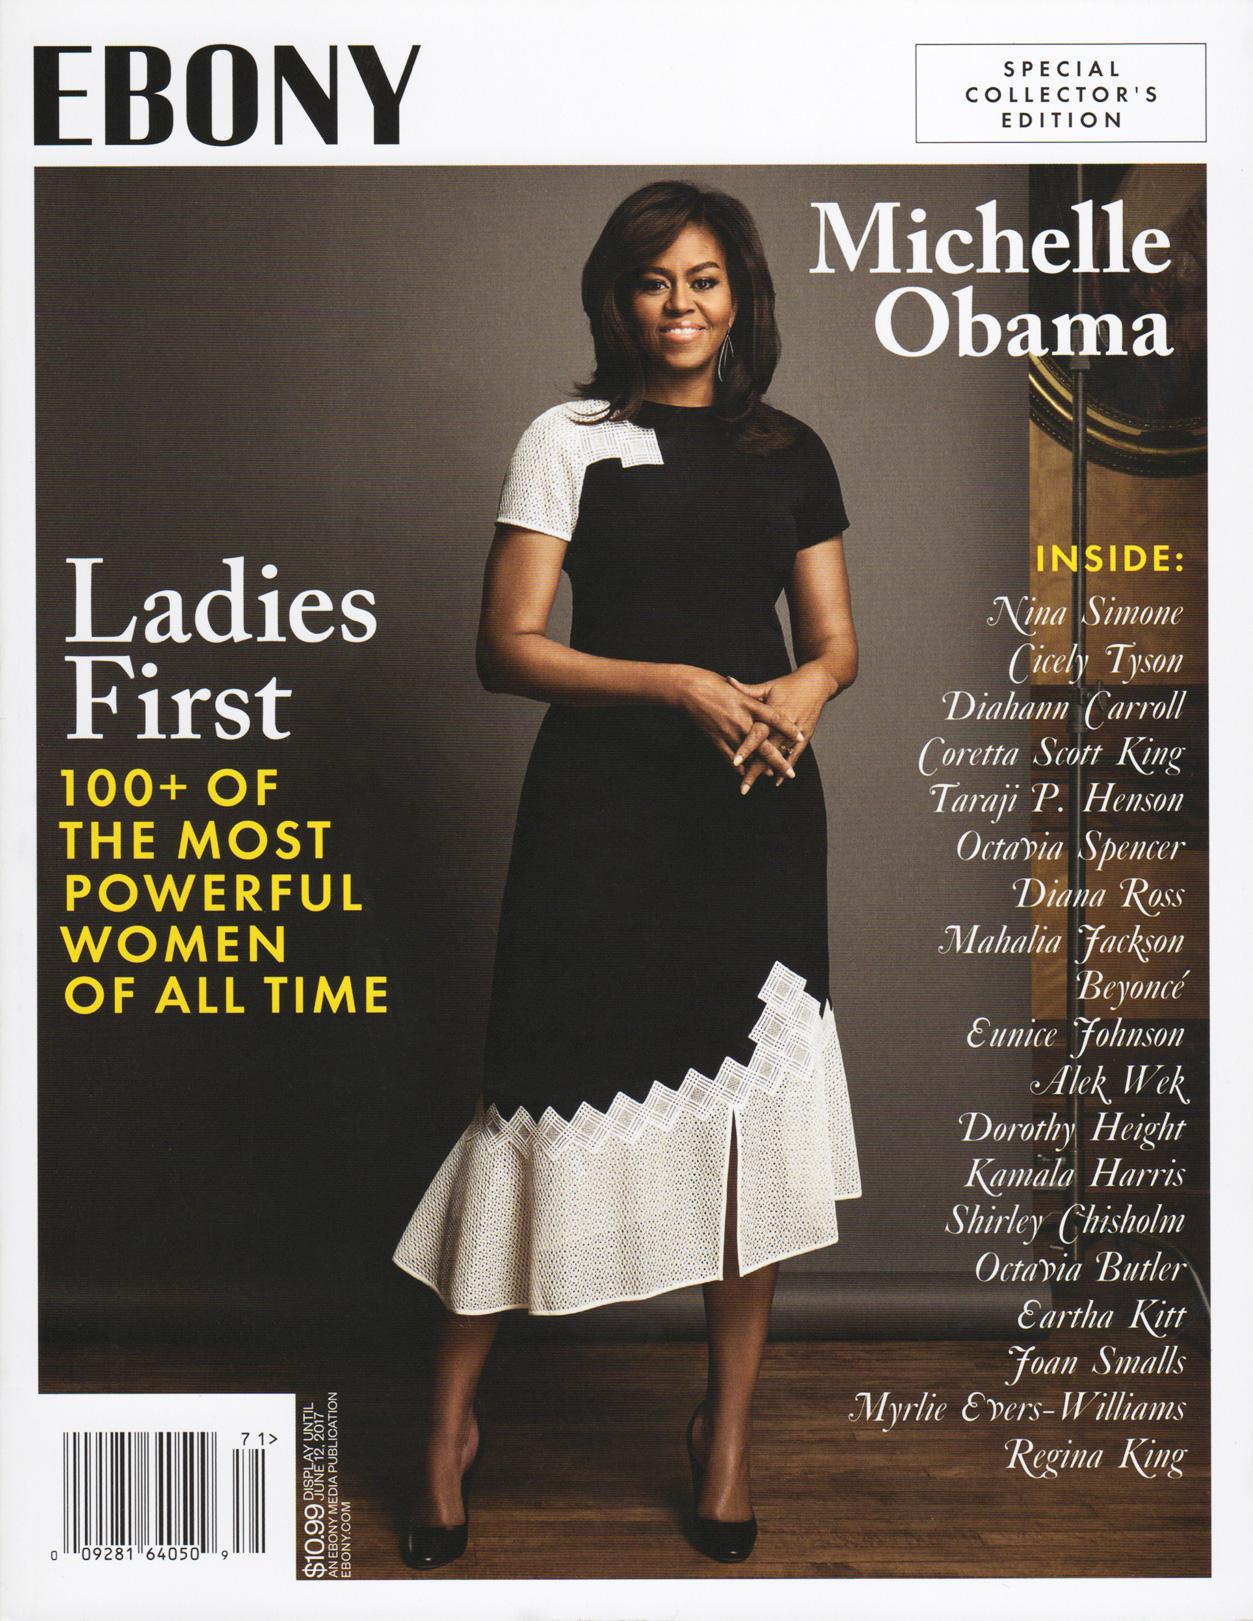 Ebony cover - 100+ Powerful Women